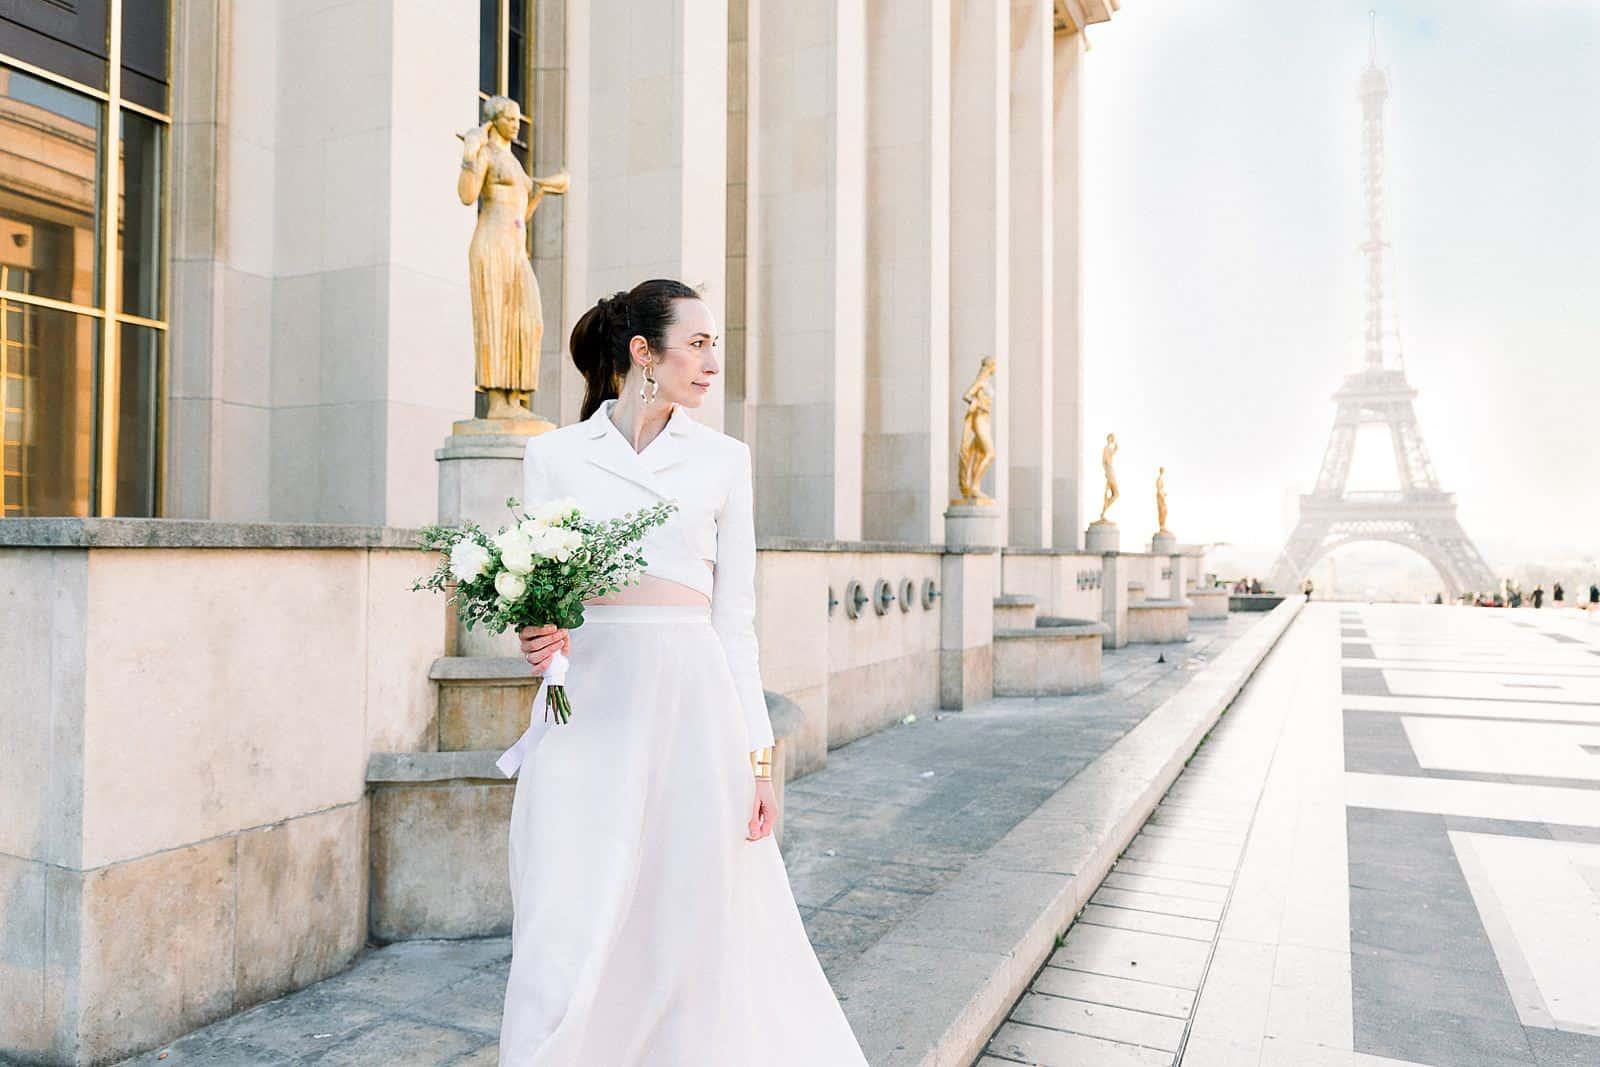 Bride in Paris, France near Eiffel Tower